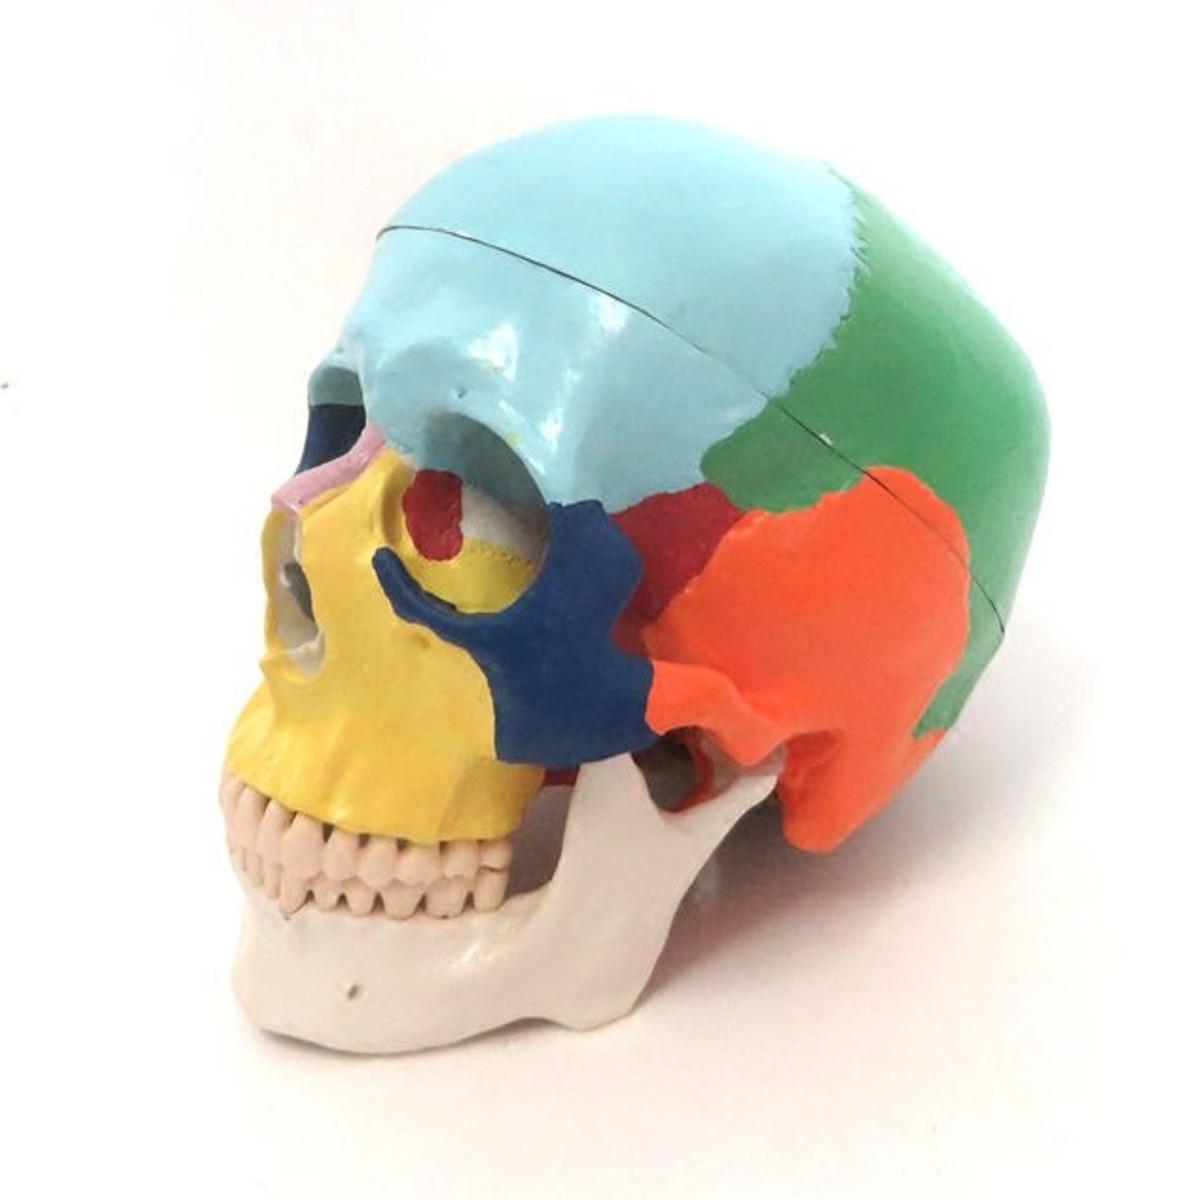 1:1 Colorful Human Head Skull Skeleton Model Medical Science Anatomy Education Adult Head Skull Skeleton Model Free Shipping1:1 Colorful Human Head Skull Skeleton Model Medical Science Anatomy Education Adult Head Skull Skeleton Model Free Shipping